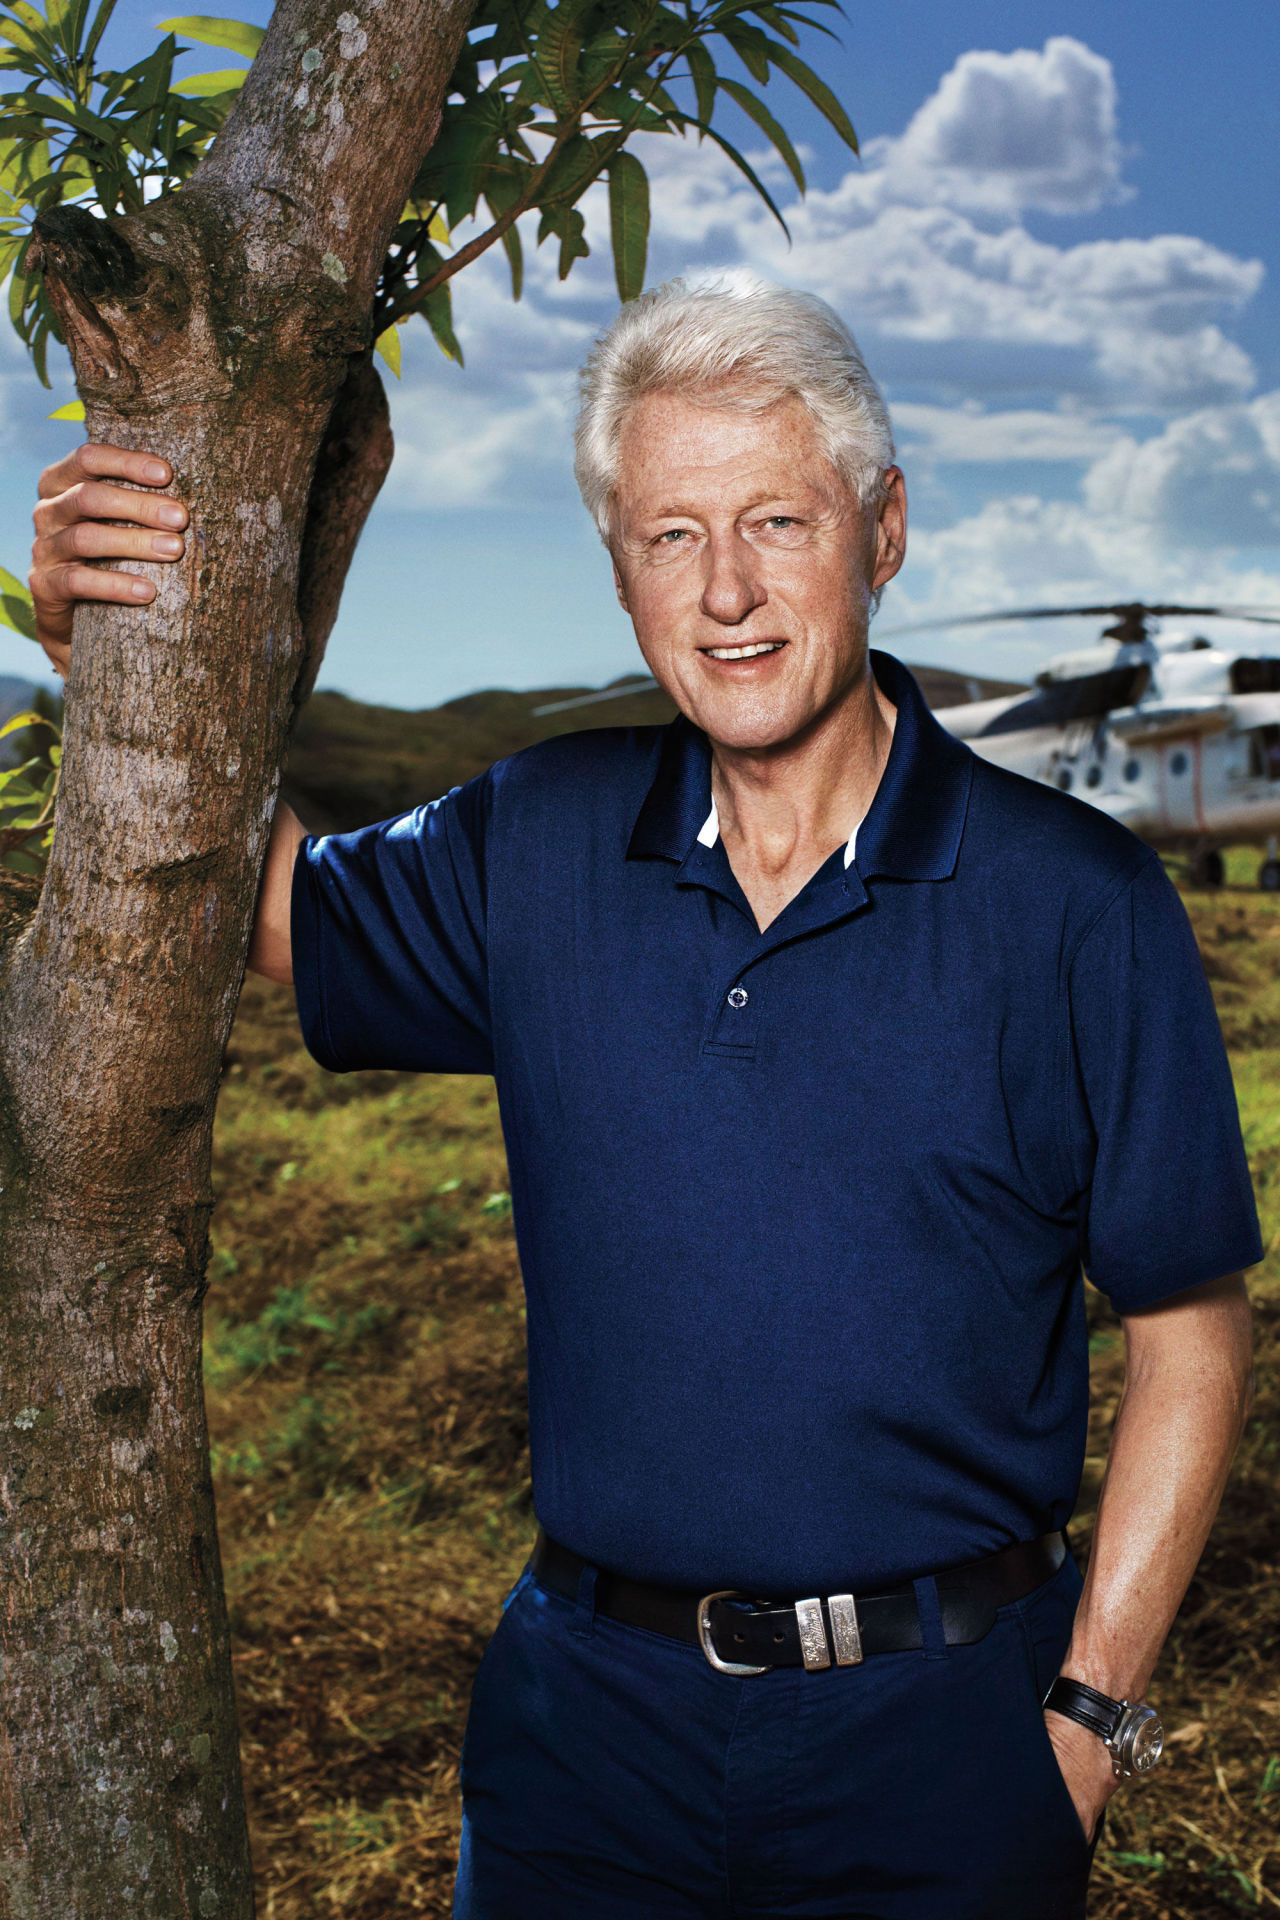 Bill Clinton photographed by Alexei Hay on Haiti's Central Plateau.